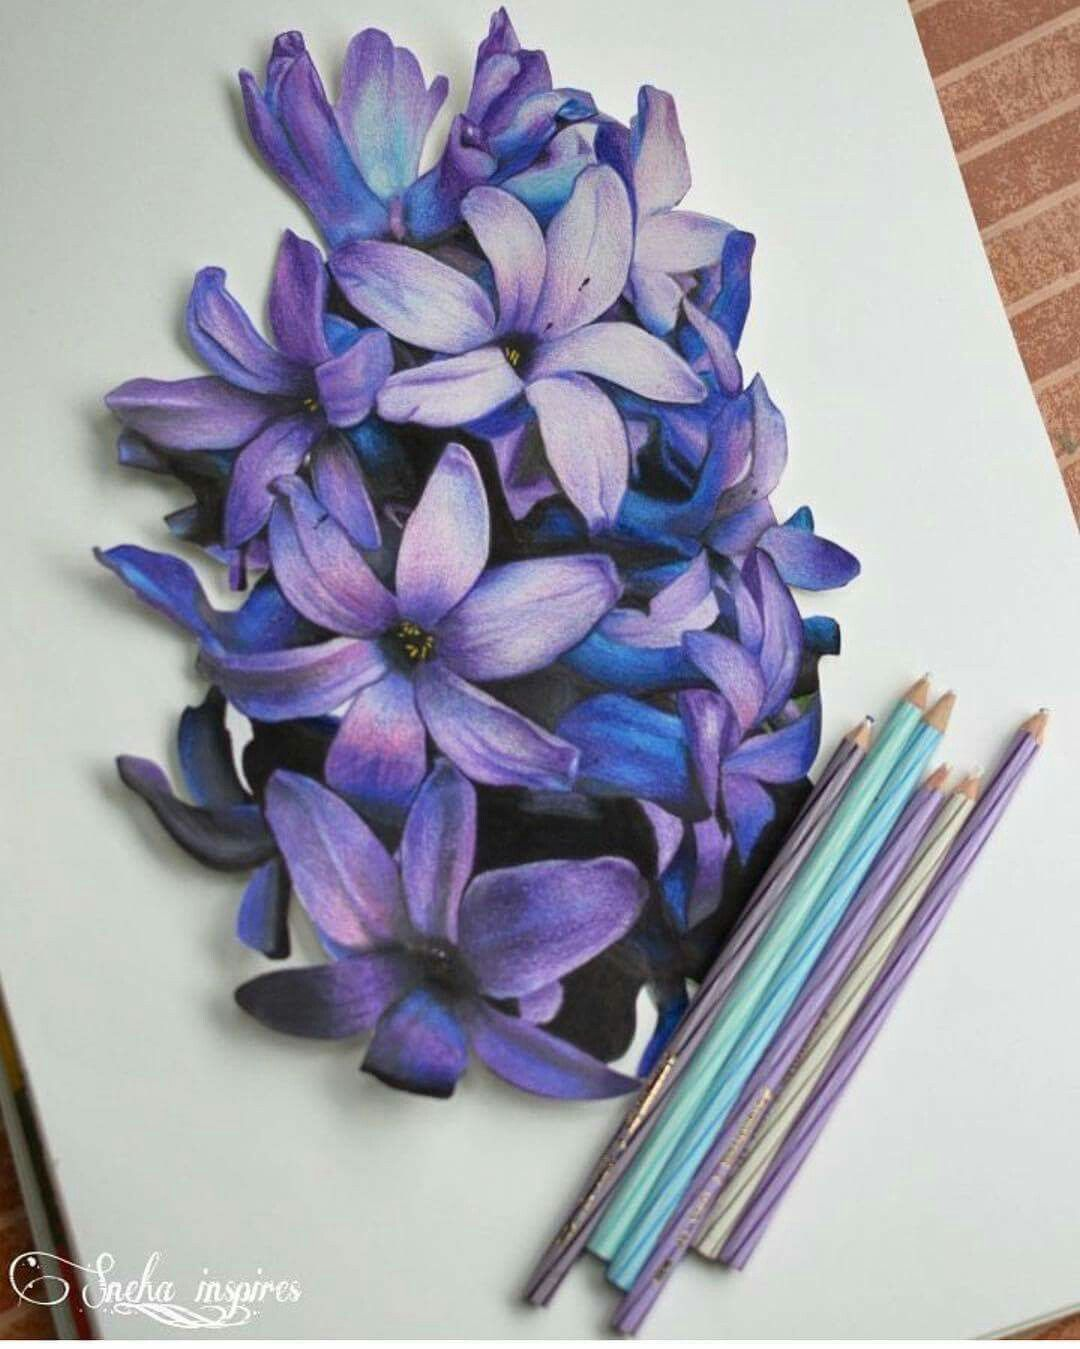 Indian Artist Sneha purple flower pencil drawing Color